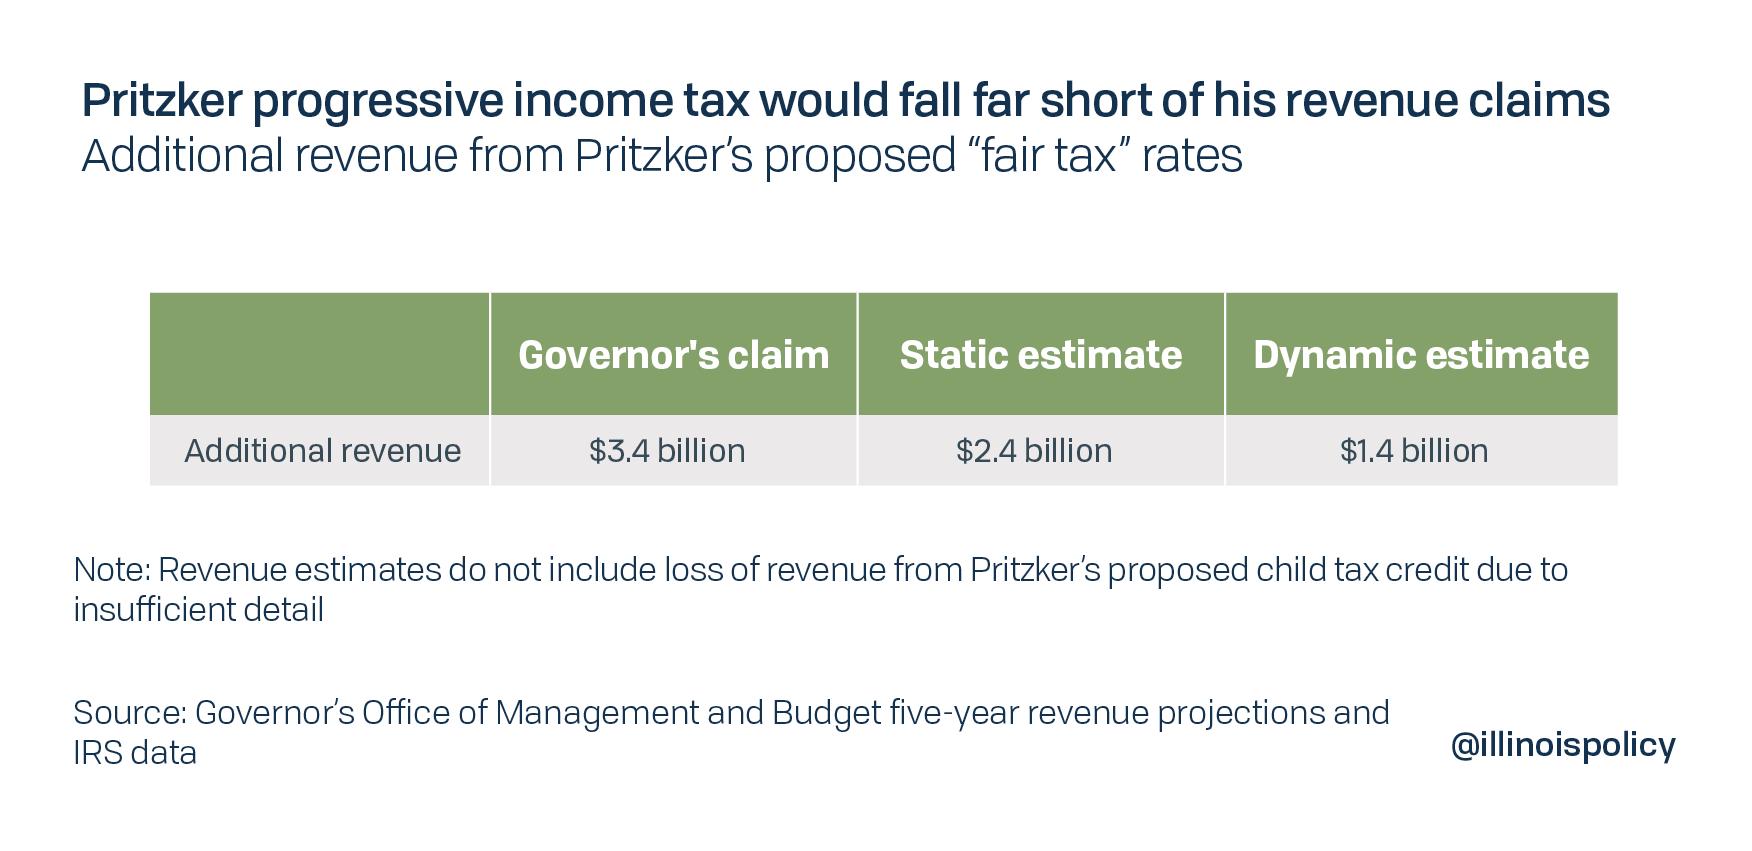 Pritzker's progressive income tax would fall far short of his revenue claims